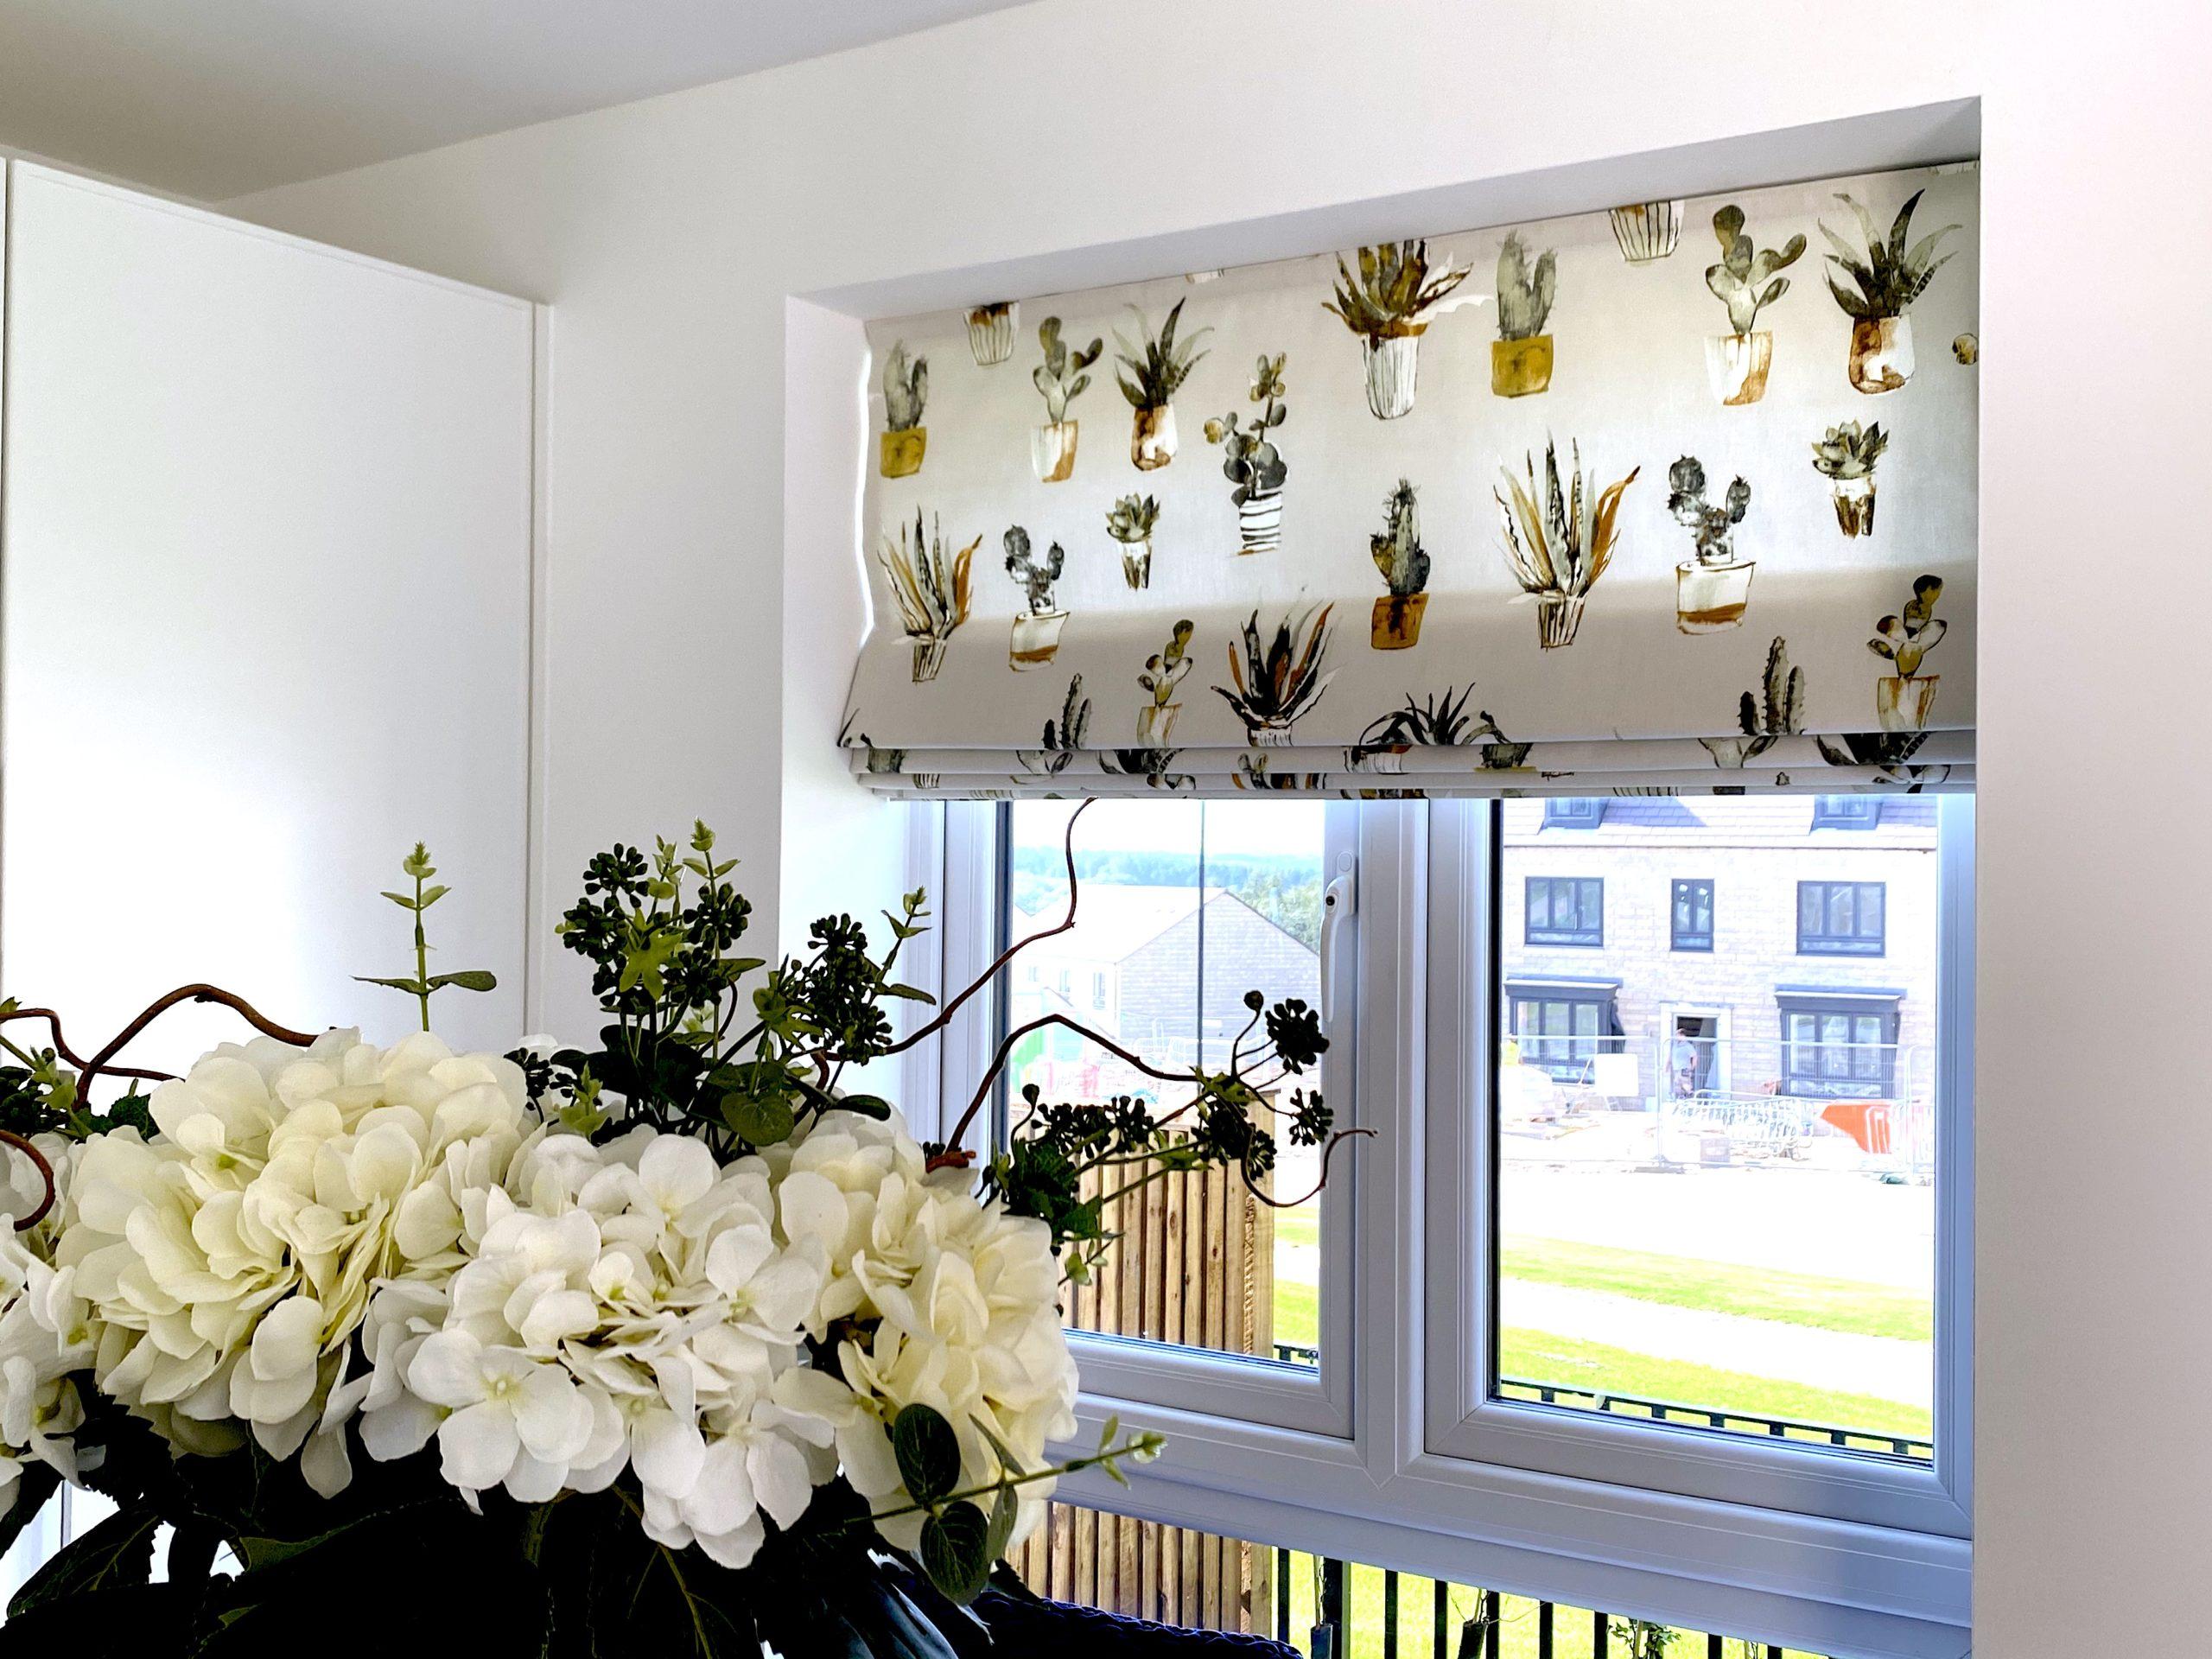 Harrogate Interiors, House & Garden, Interior inspiration, How to